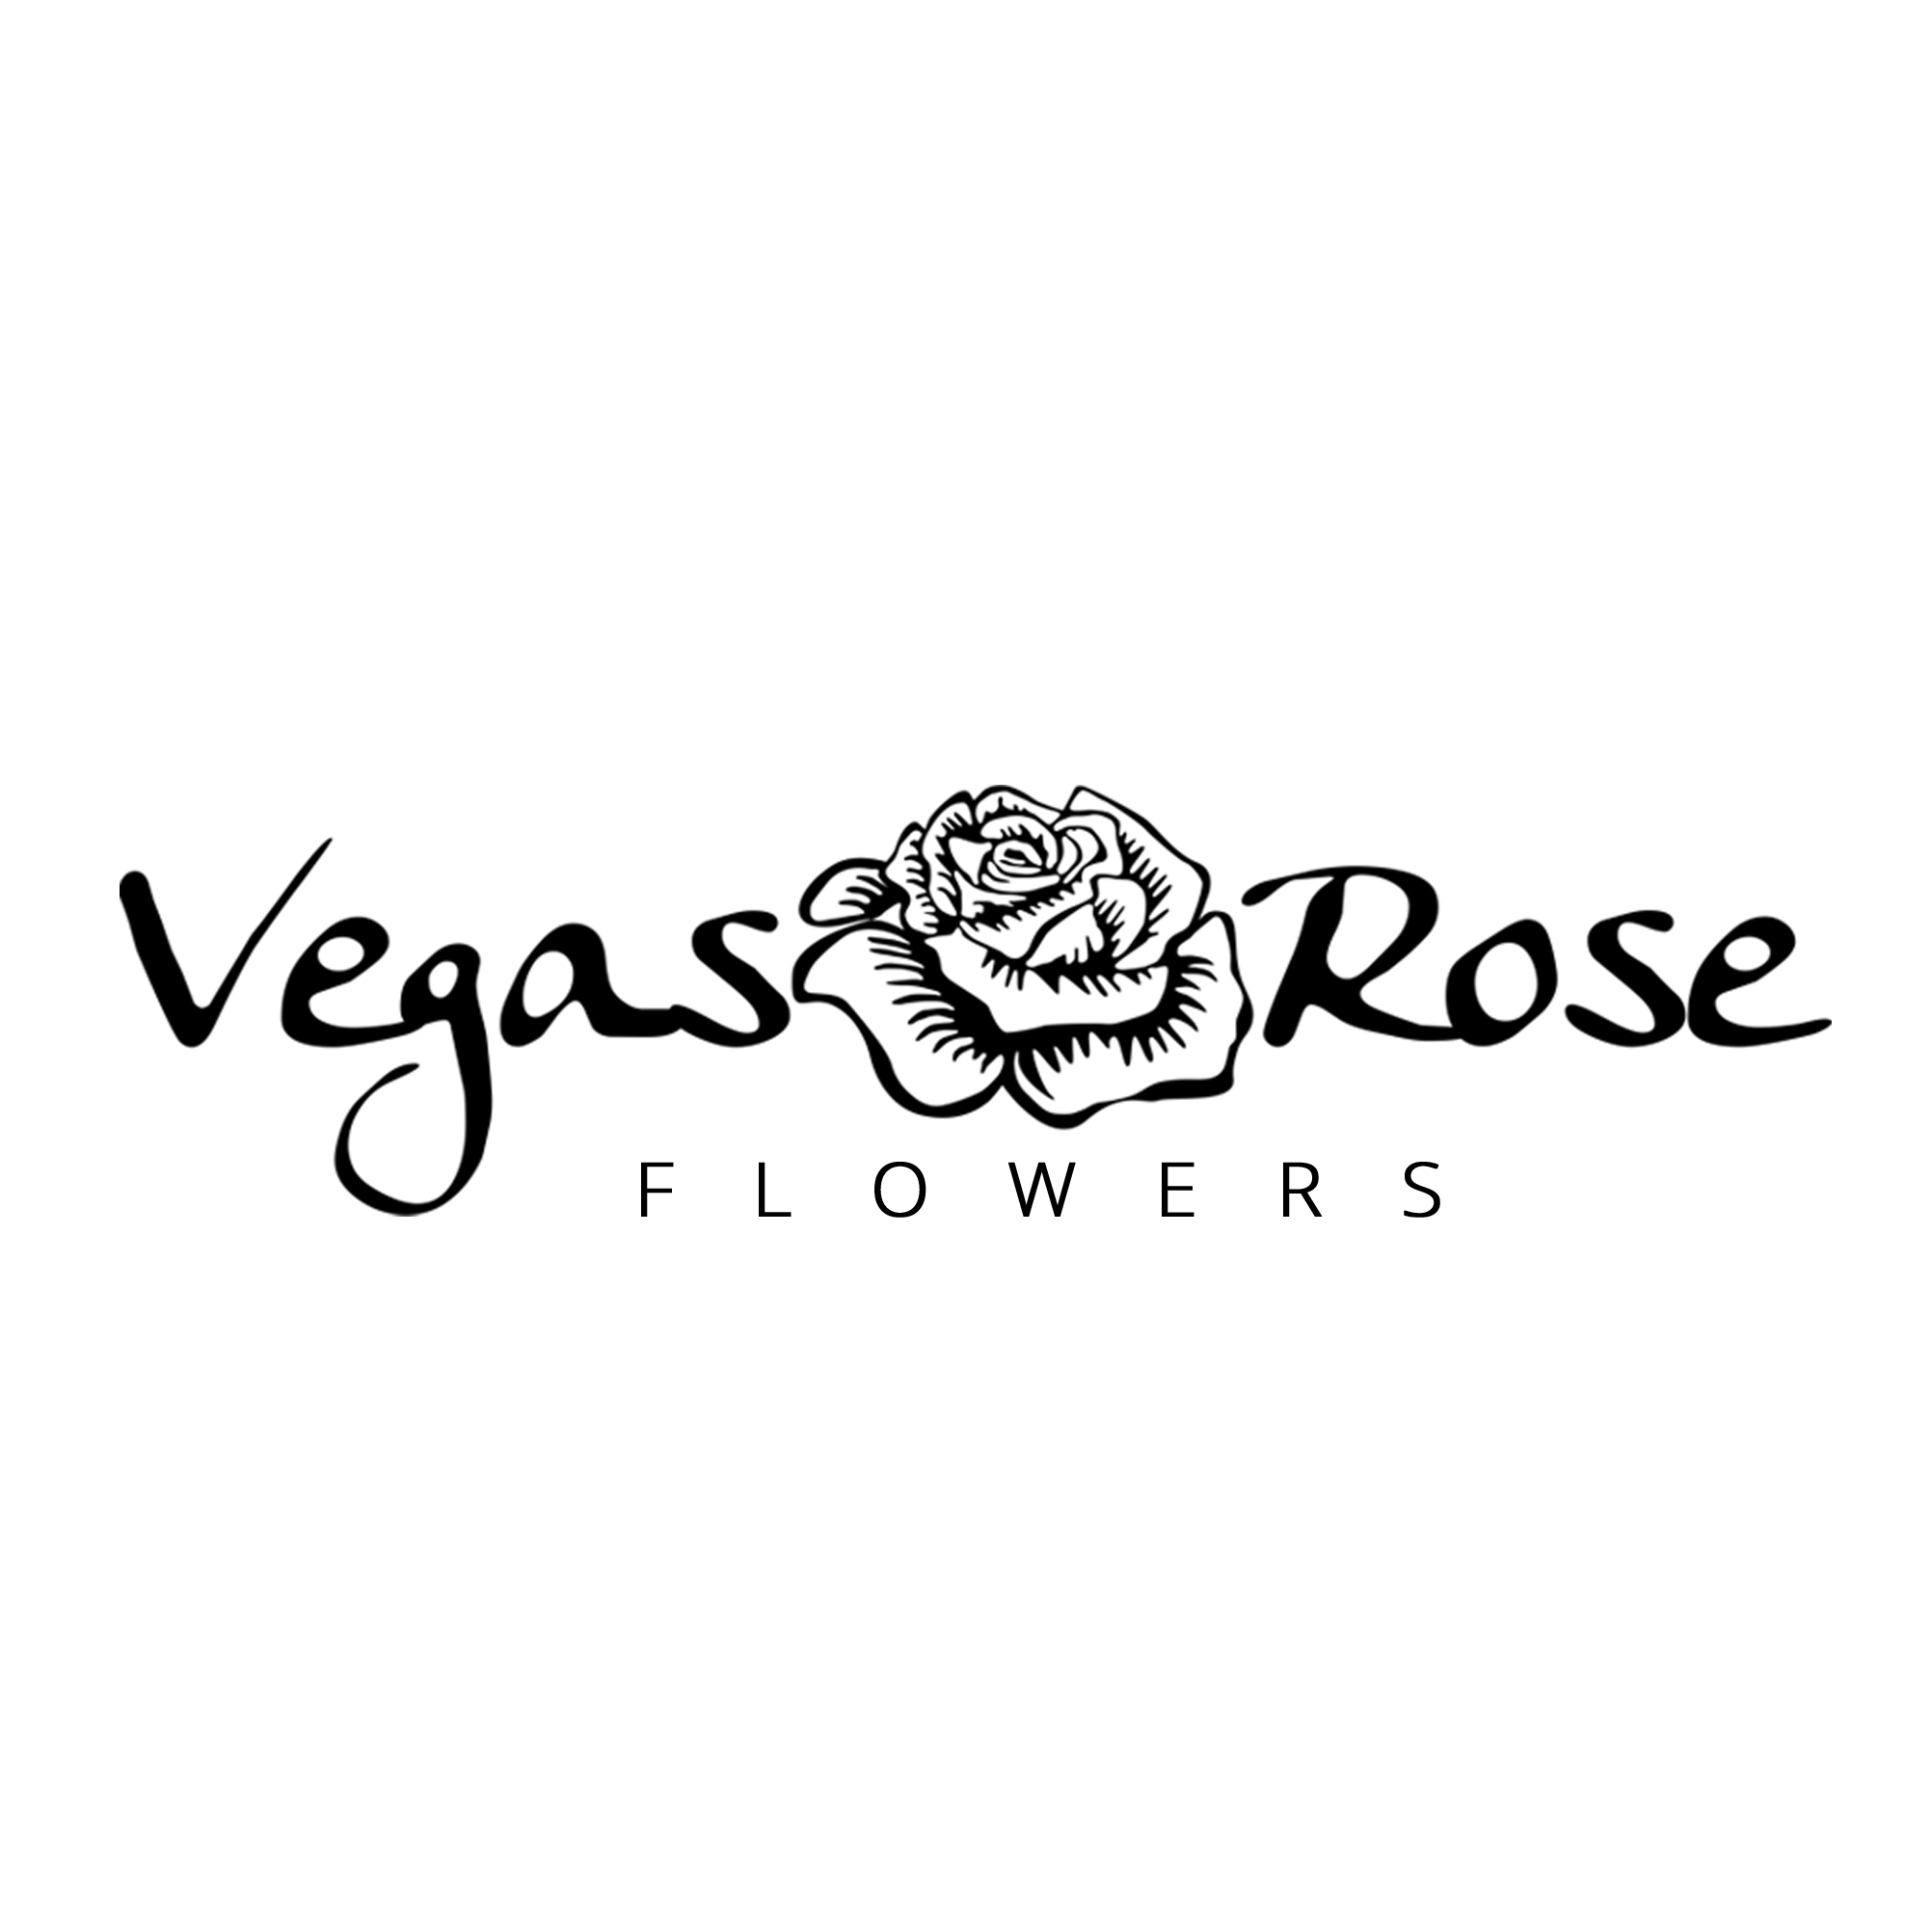 Vegas Rose Flowers